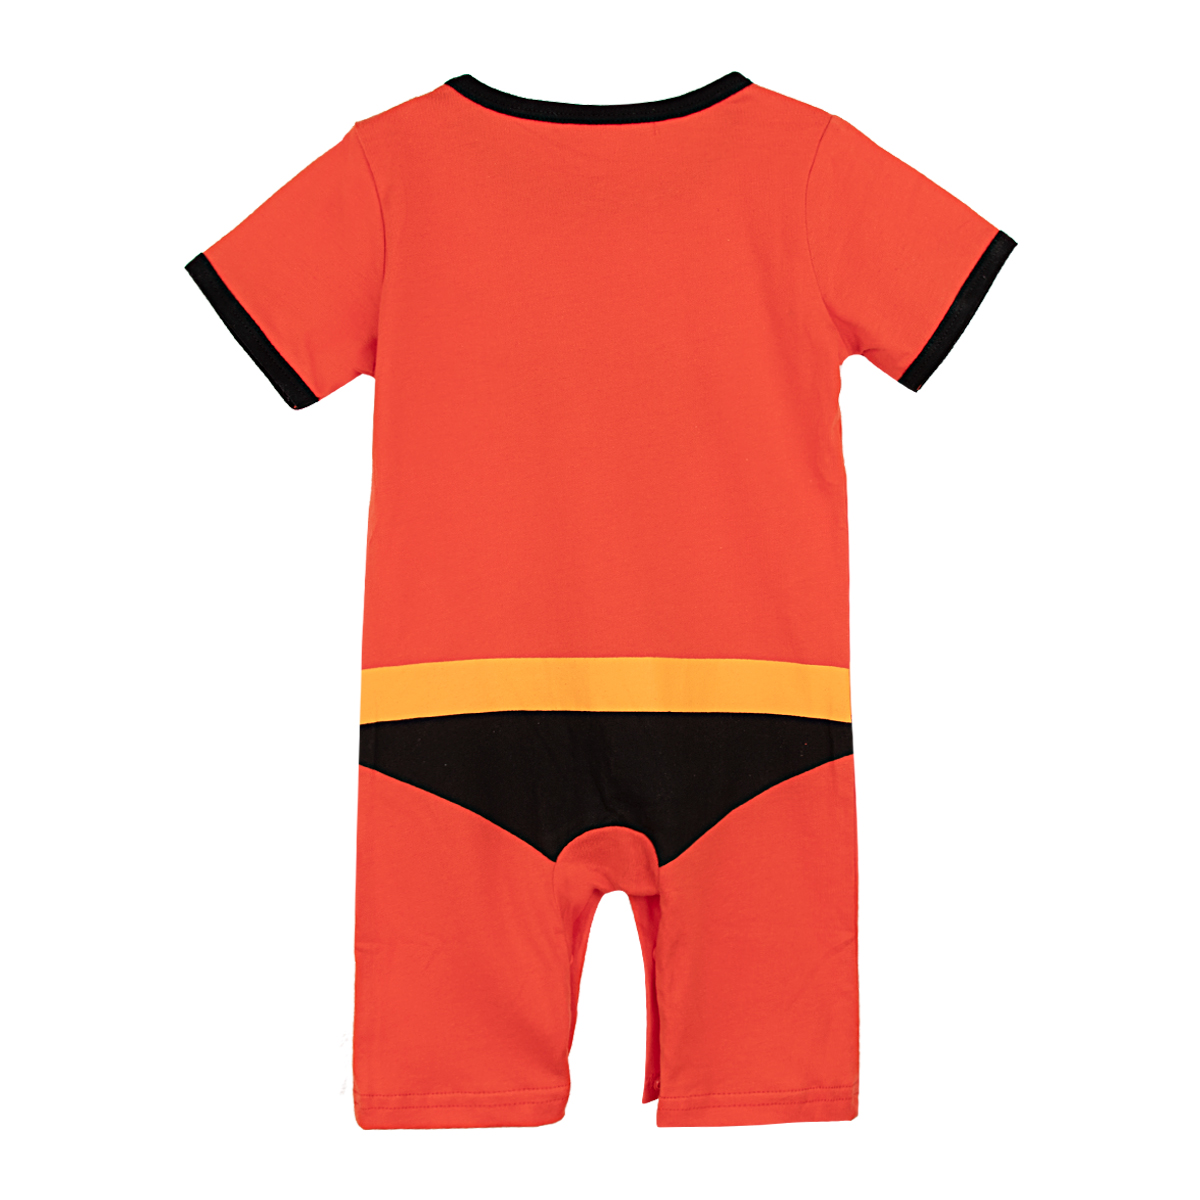 Newborn Baby Boy Dragon Ball Z Costume Romper Vegeta Outfit Infant Playsuit Gift